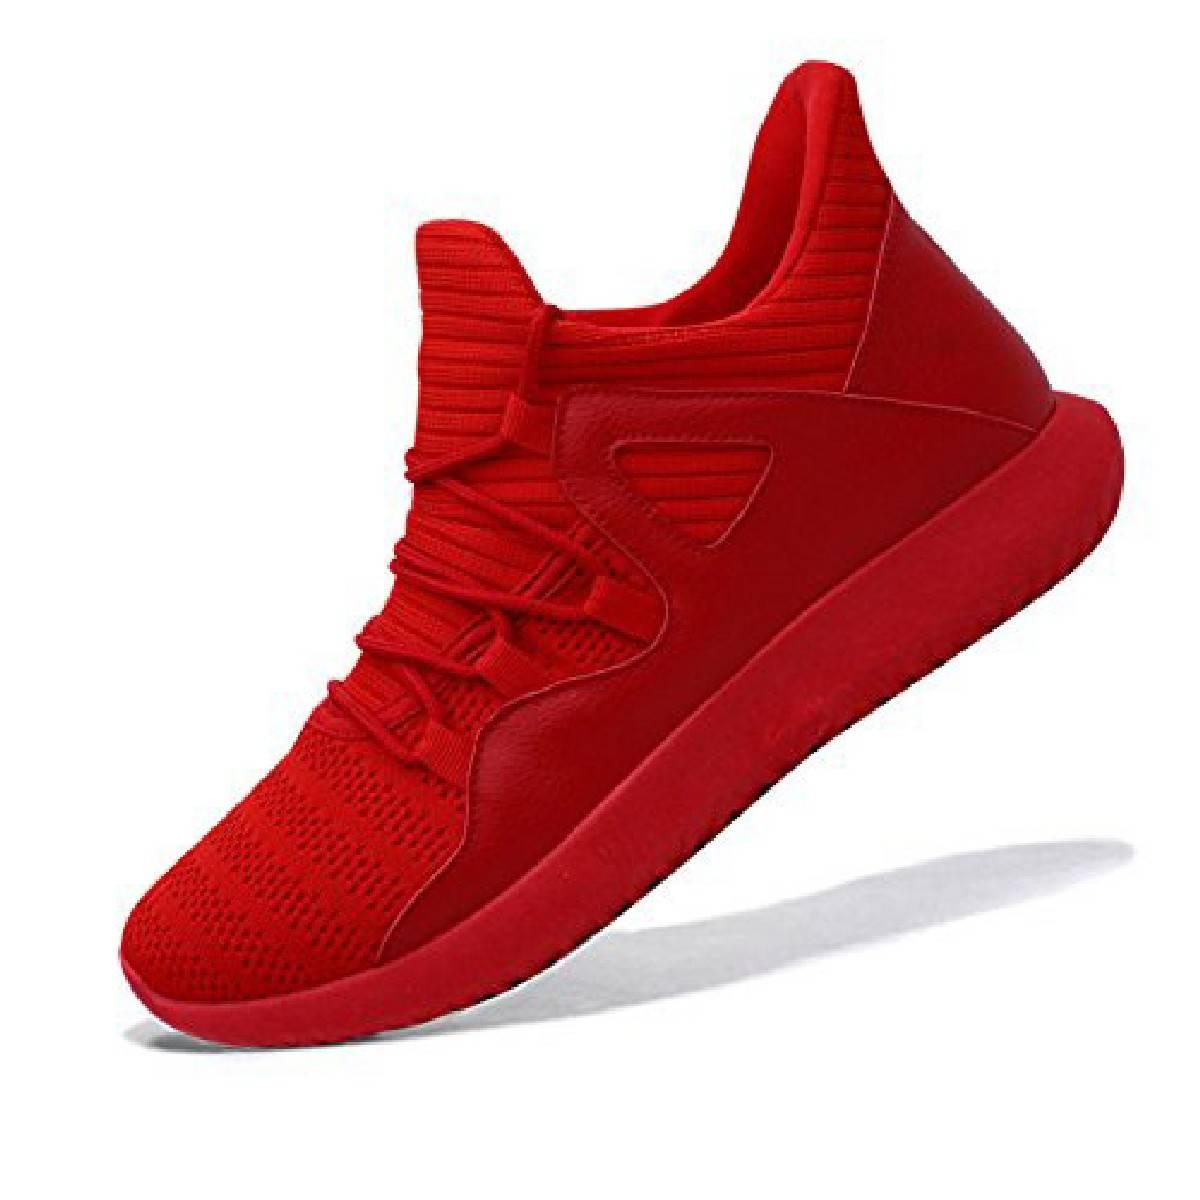 Fashion Red Sneaker for Men